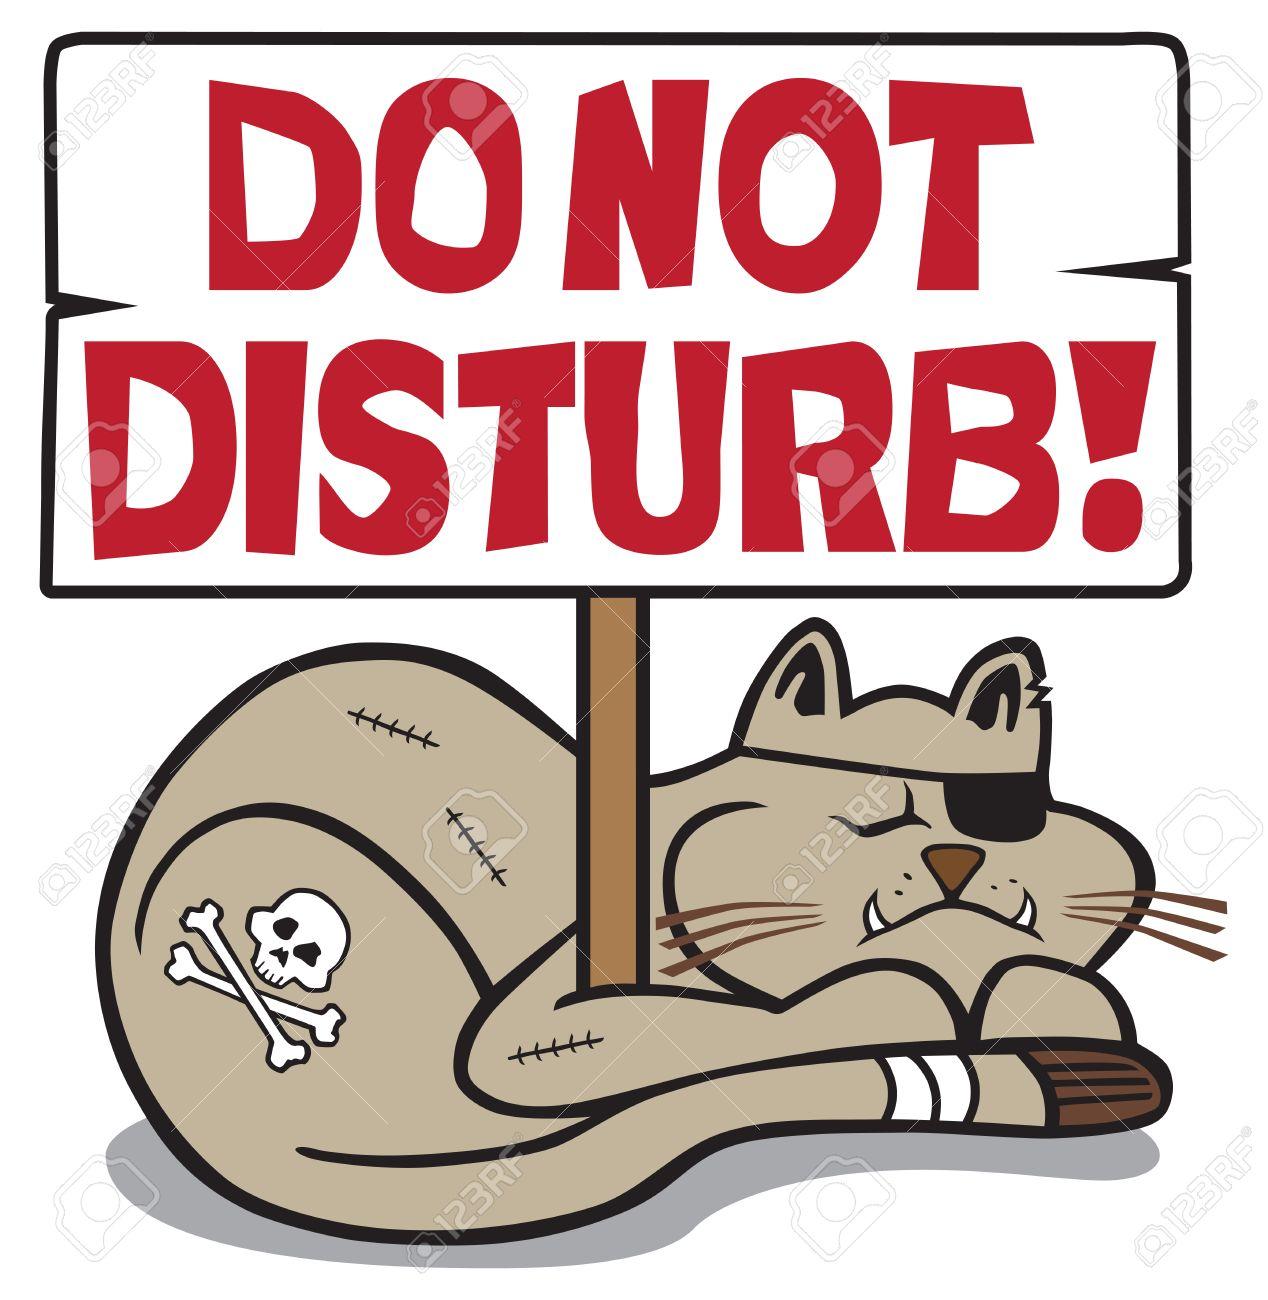 Tough, battered cat taking a nap under a do not disturb sign.